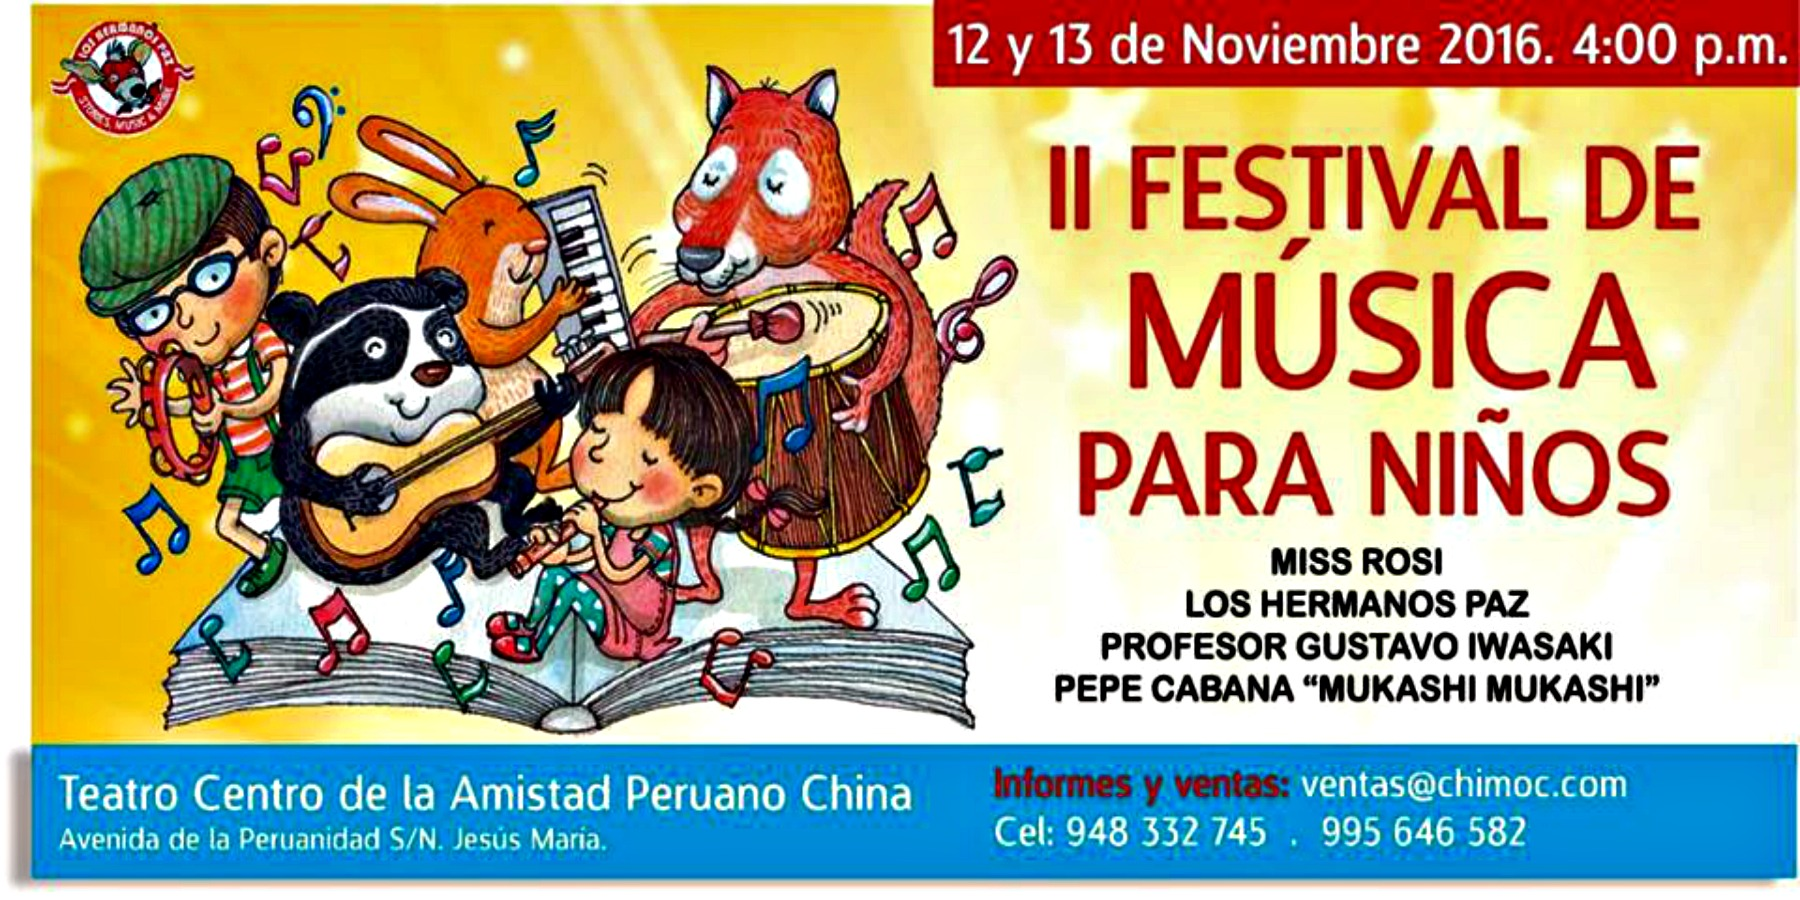 II Festival de Música Para Niños